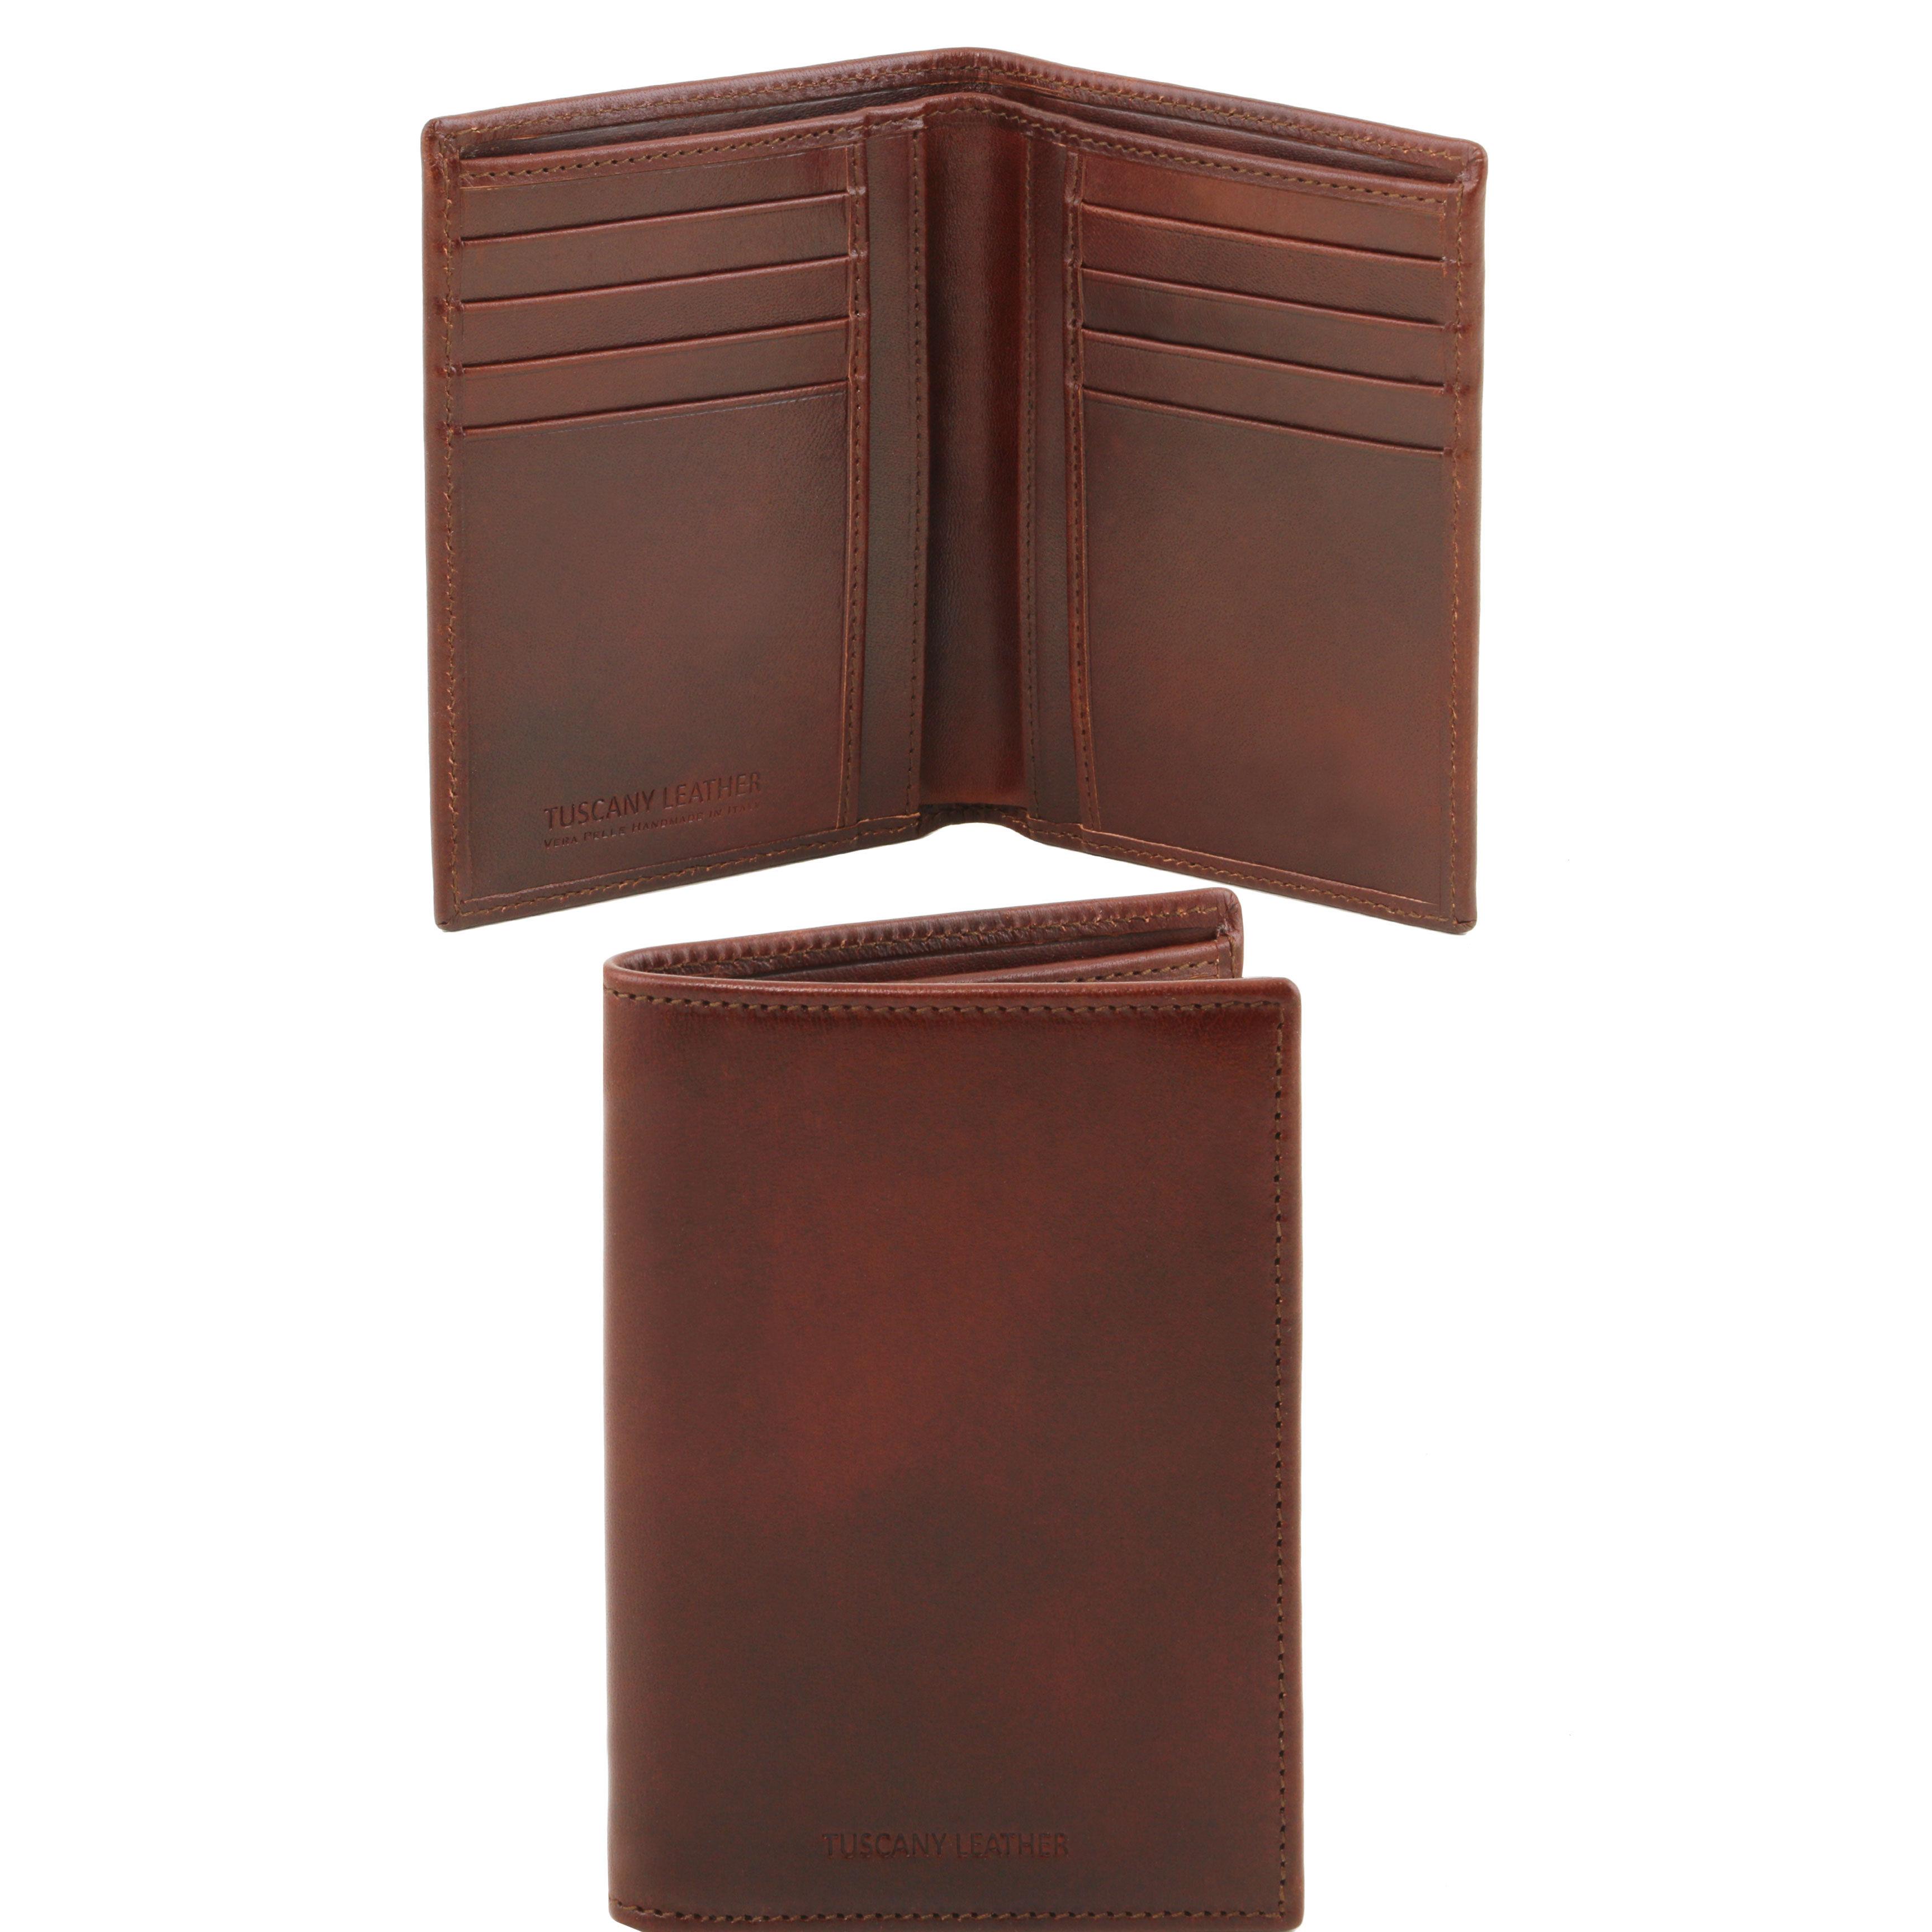 Portofel vertical din piele maro 2 fold